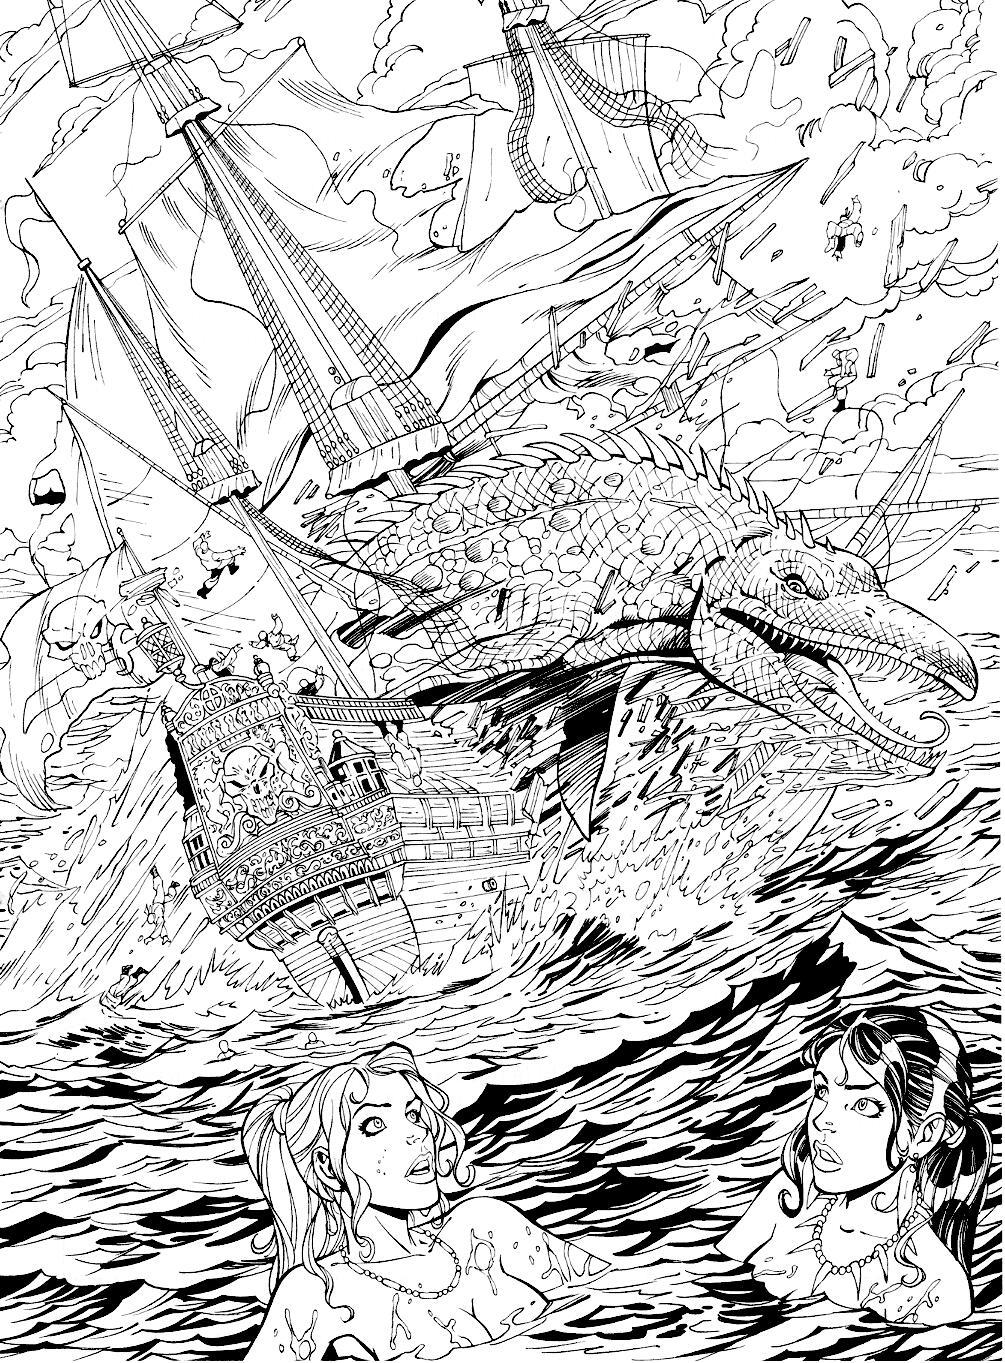 Read online Jungle Fantasy (2002) comic -  Issue #1 - 25